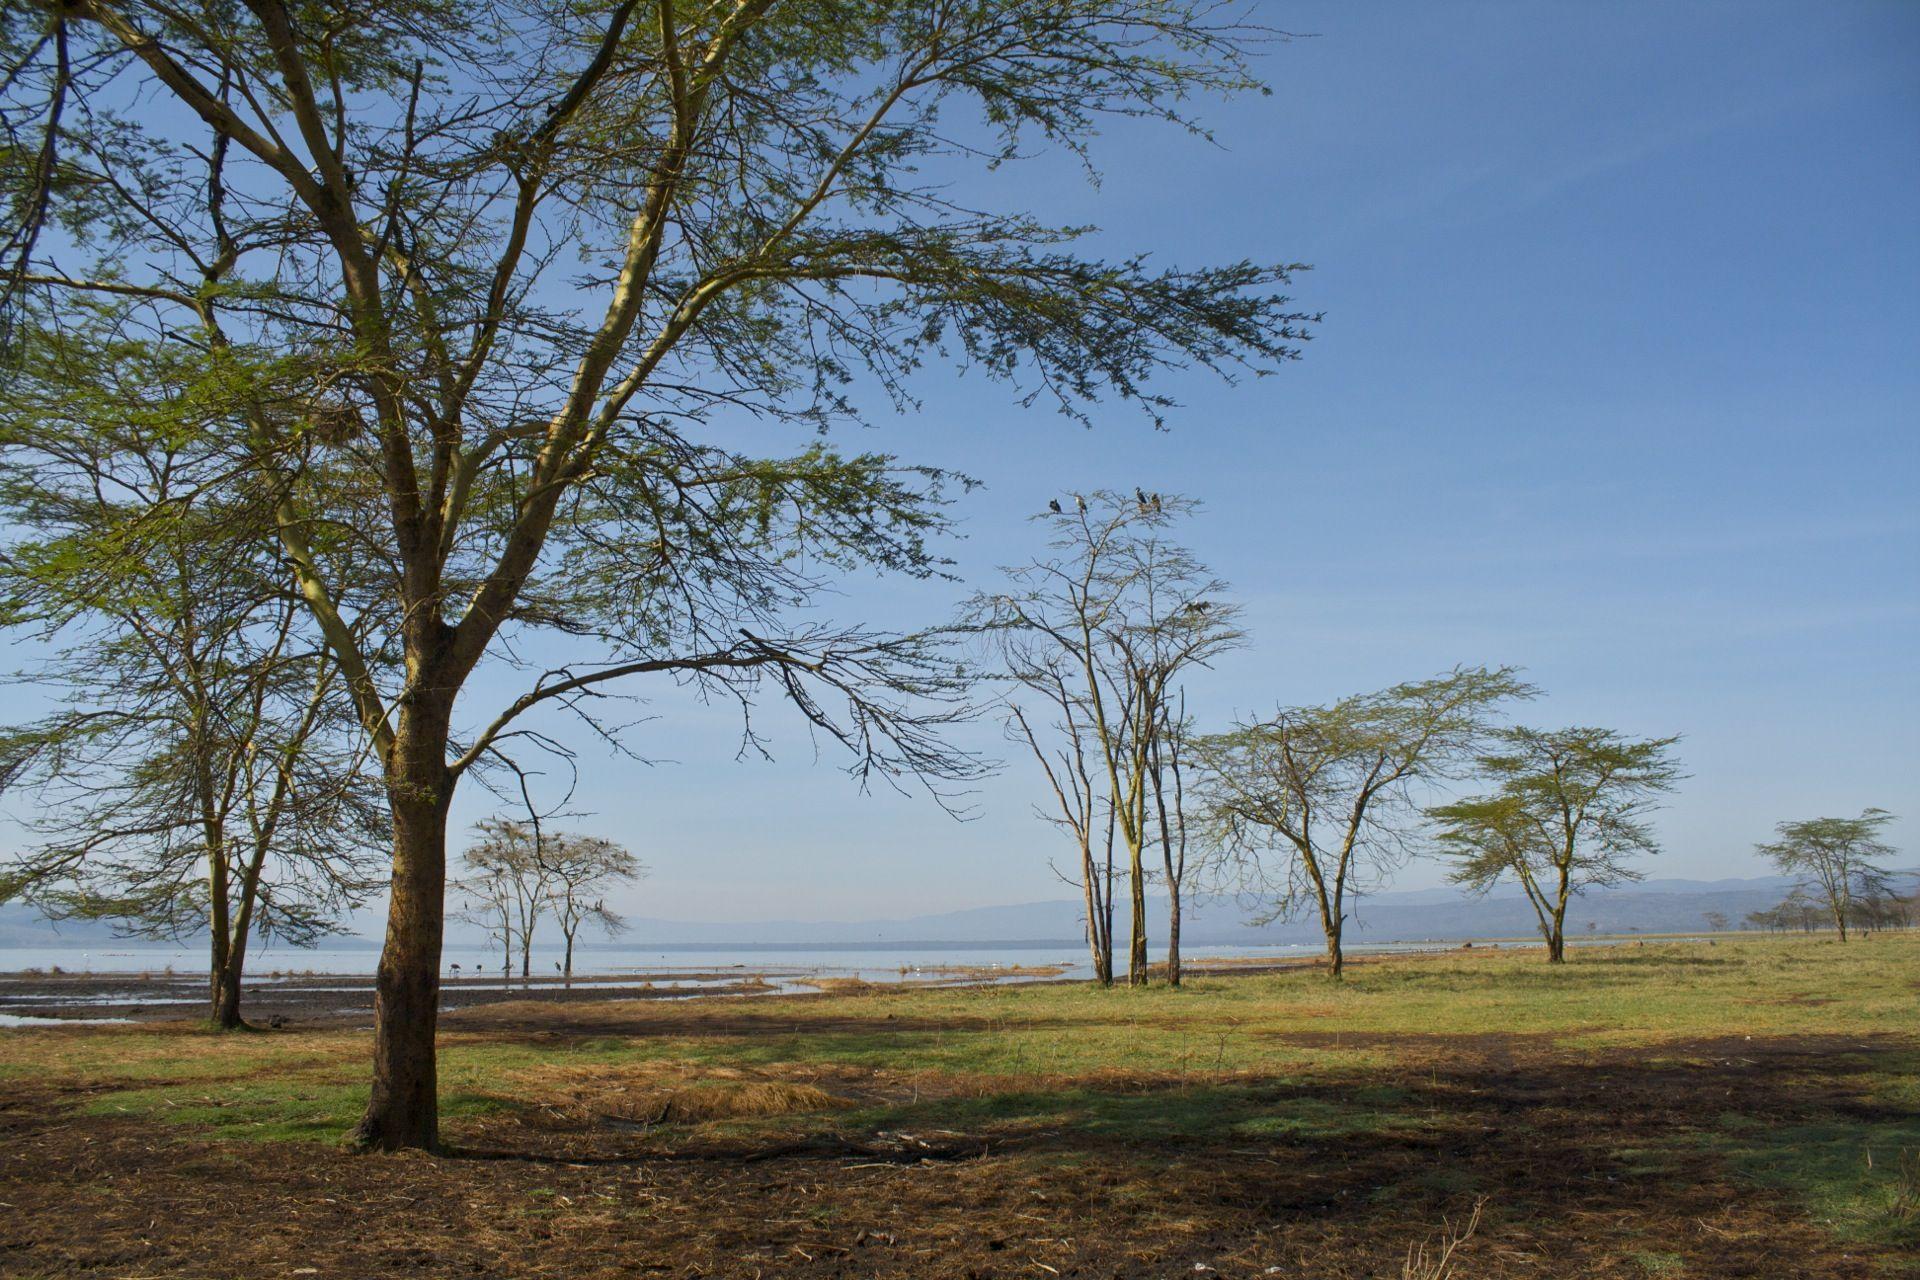 Nakuru Lake, #Nakuru, #Kenya #wikoftheday Want to visit Kenya? http://bit.ly/VTZDZI